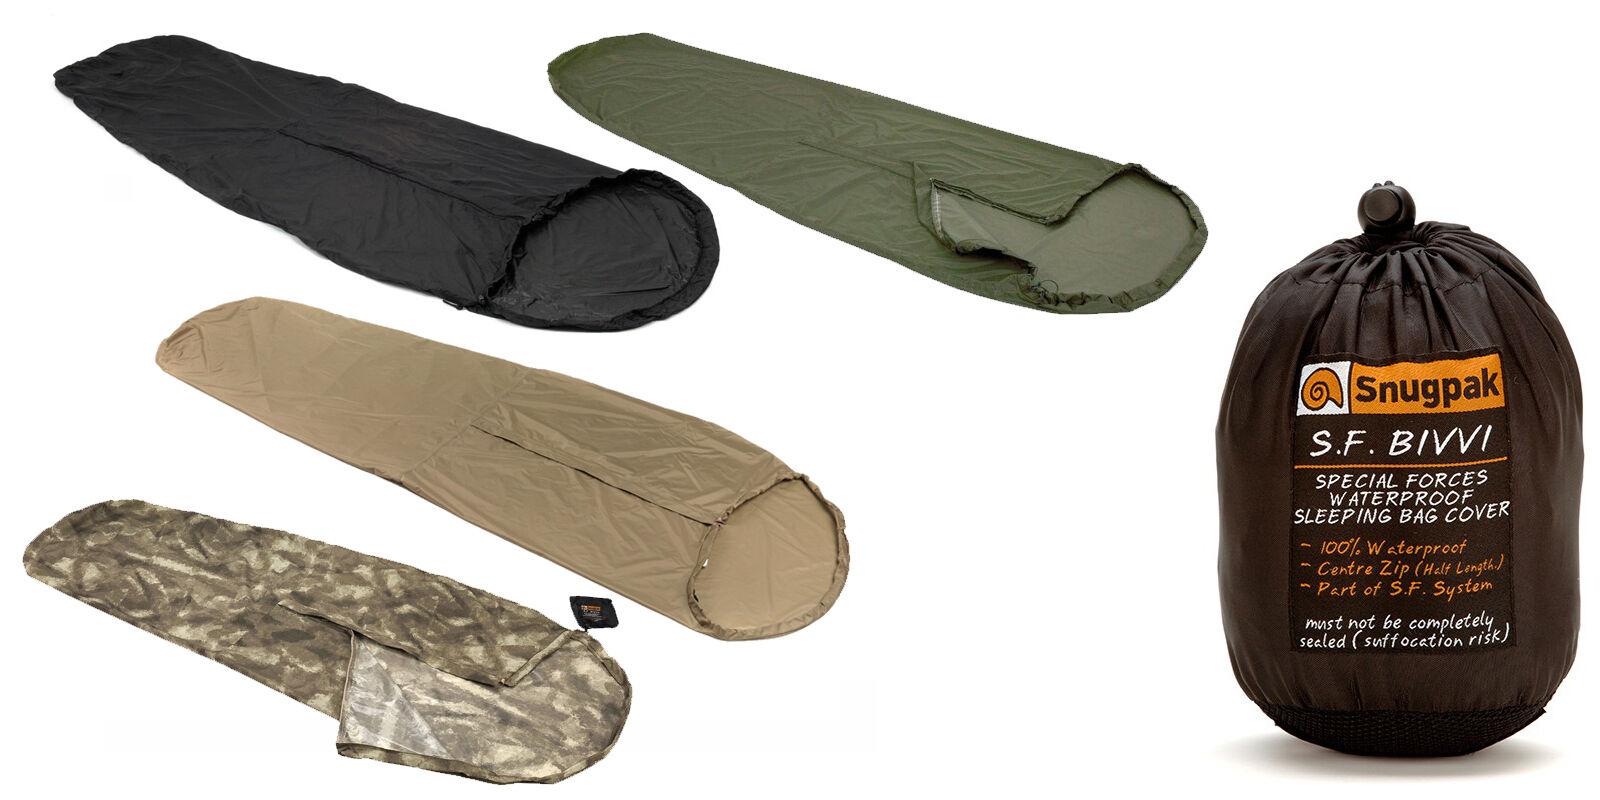 UK Made Snugpak Special Forces Bivvi  Bag Essential for Hillwalking & Mountaineer  world famous sale online